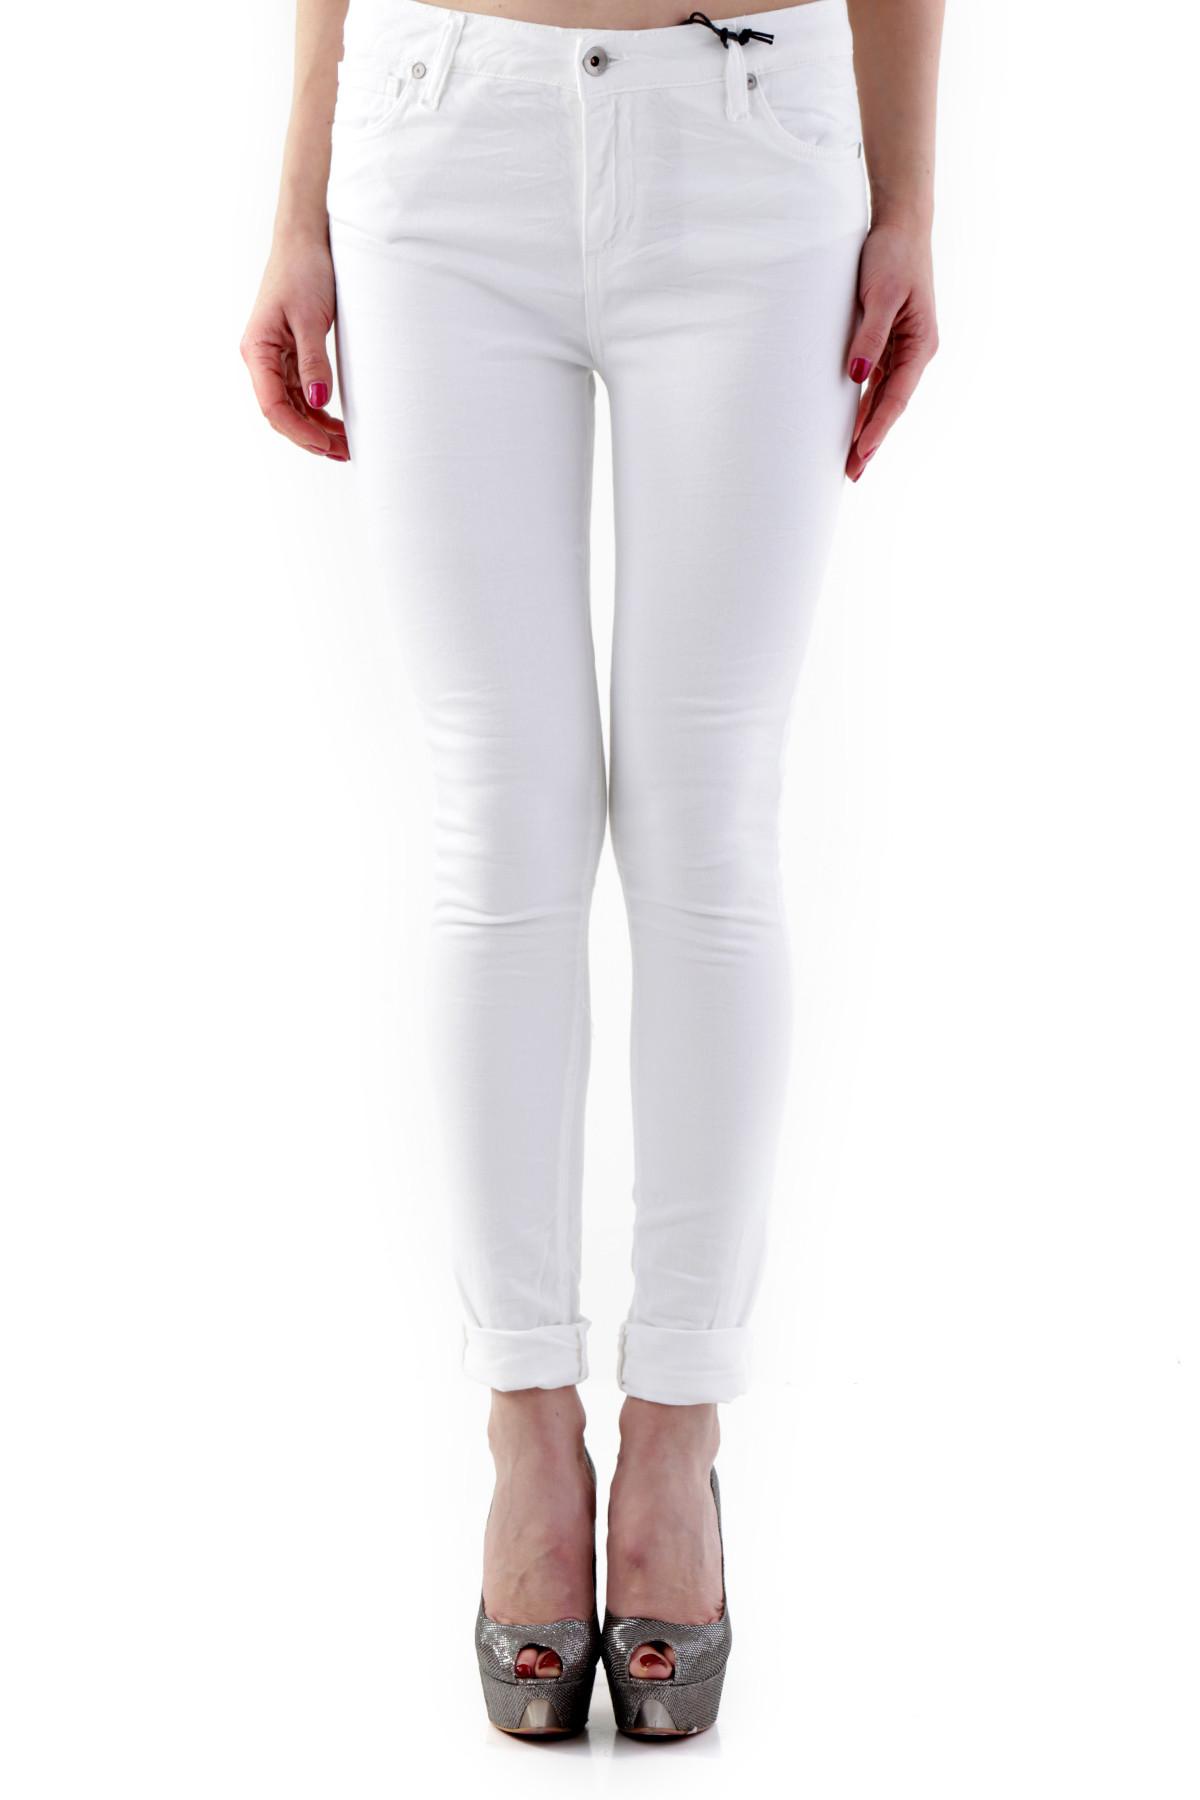 525Marchio: 525; Genere: Donna; Tipologia: Pantaloni…